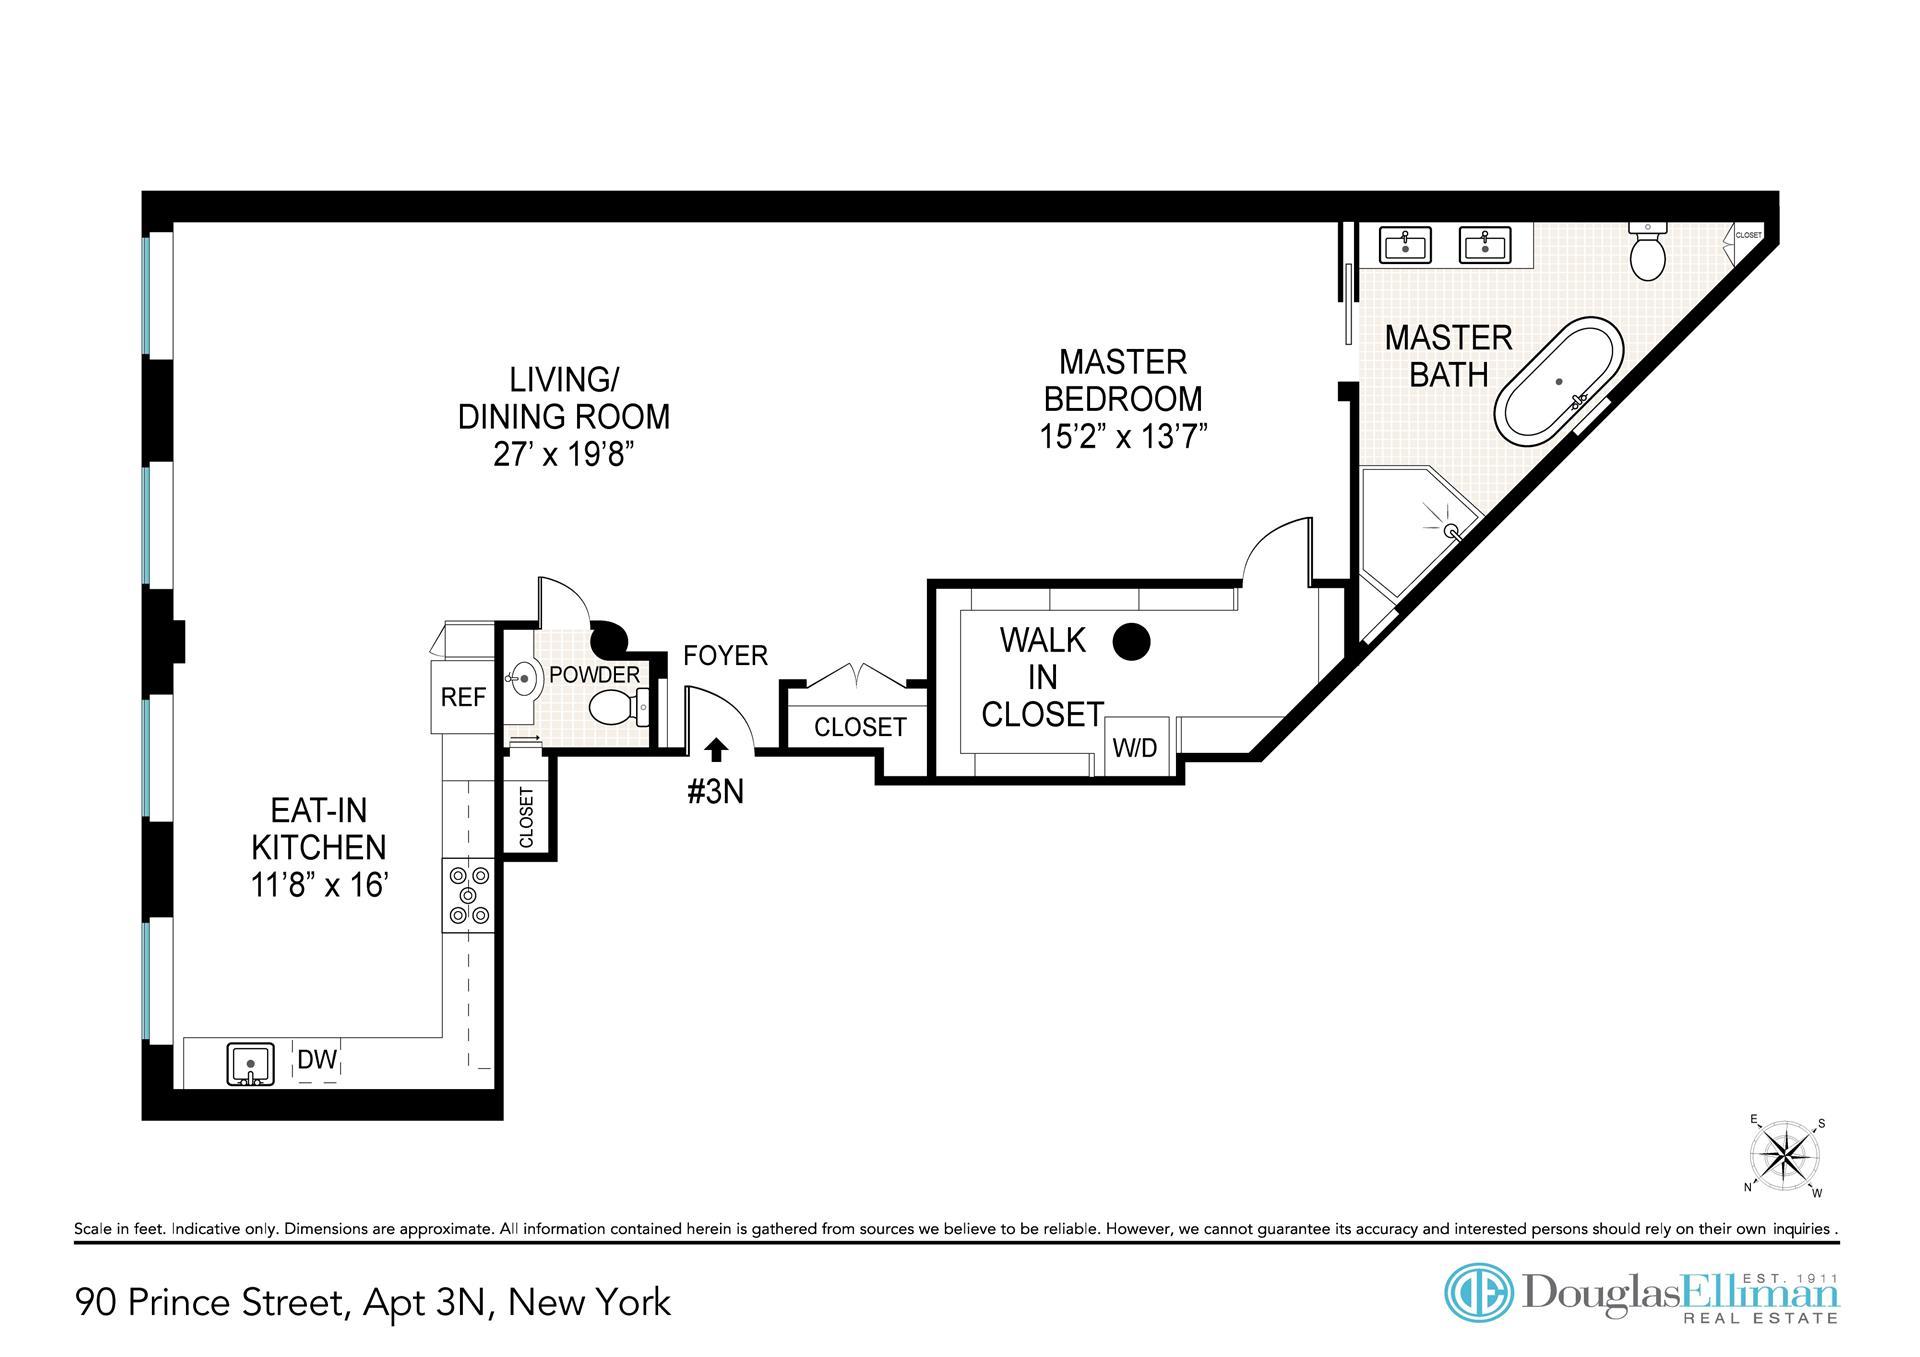 Floor plan of Unique Soho Loft, 90 Prince St, 3N - SoHo - Nolita, New York